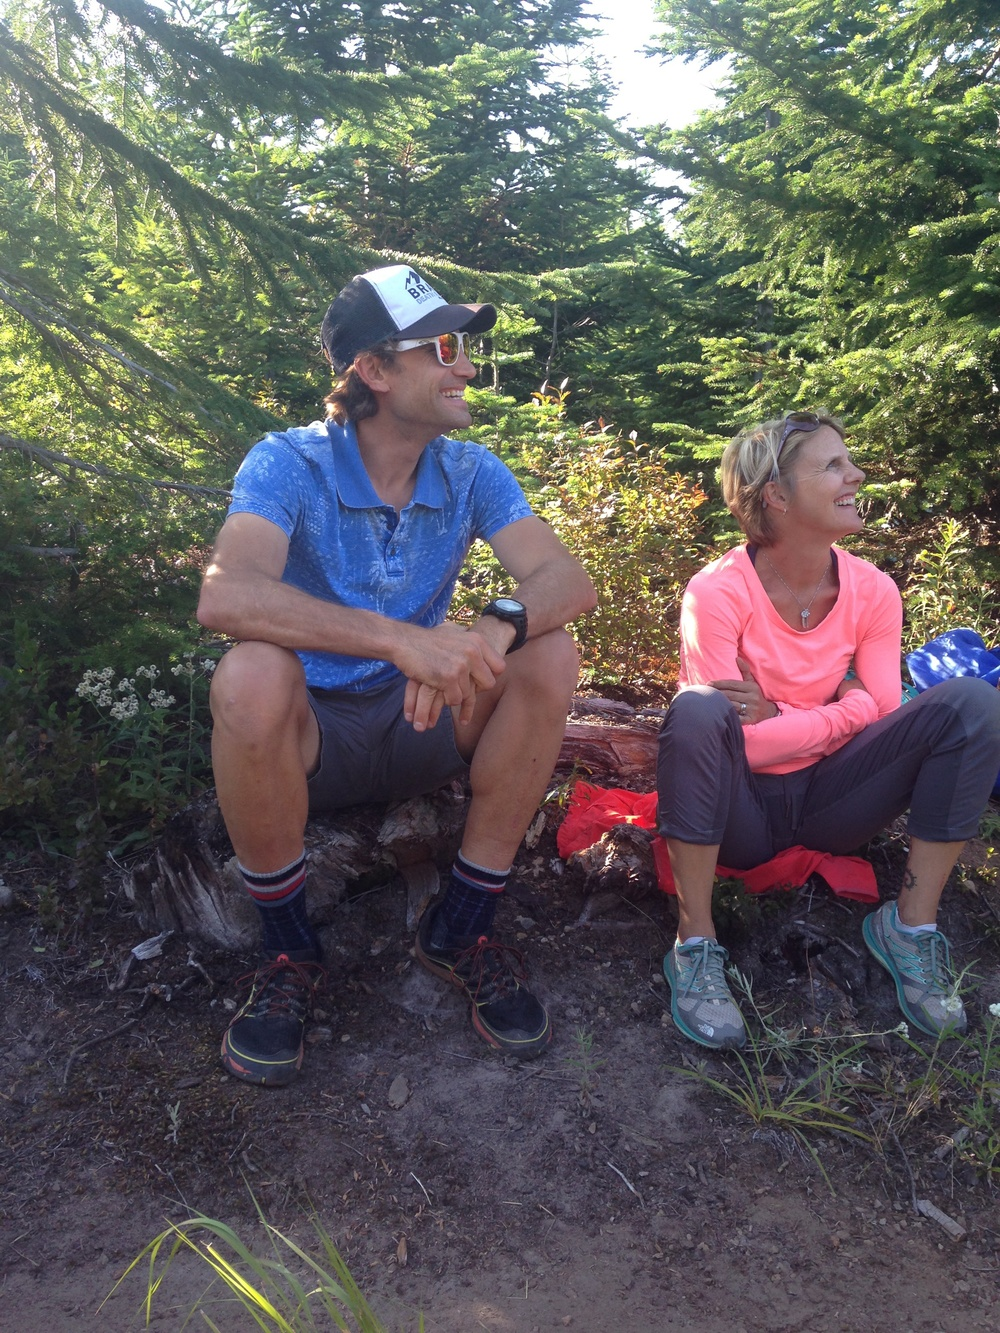 Crew chief Saira and pacer '@adventuresimon' Simon Donato of Boundless TV fame.